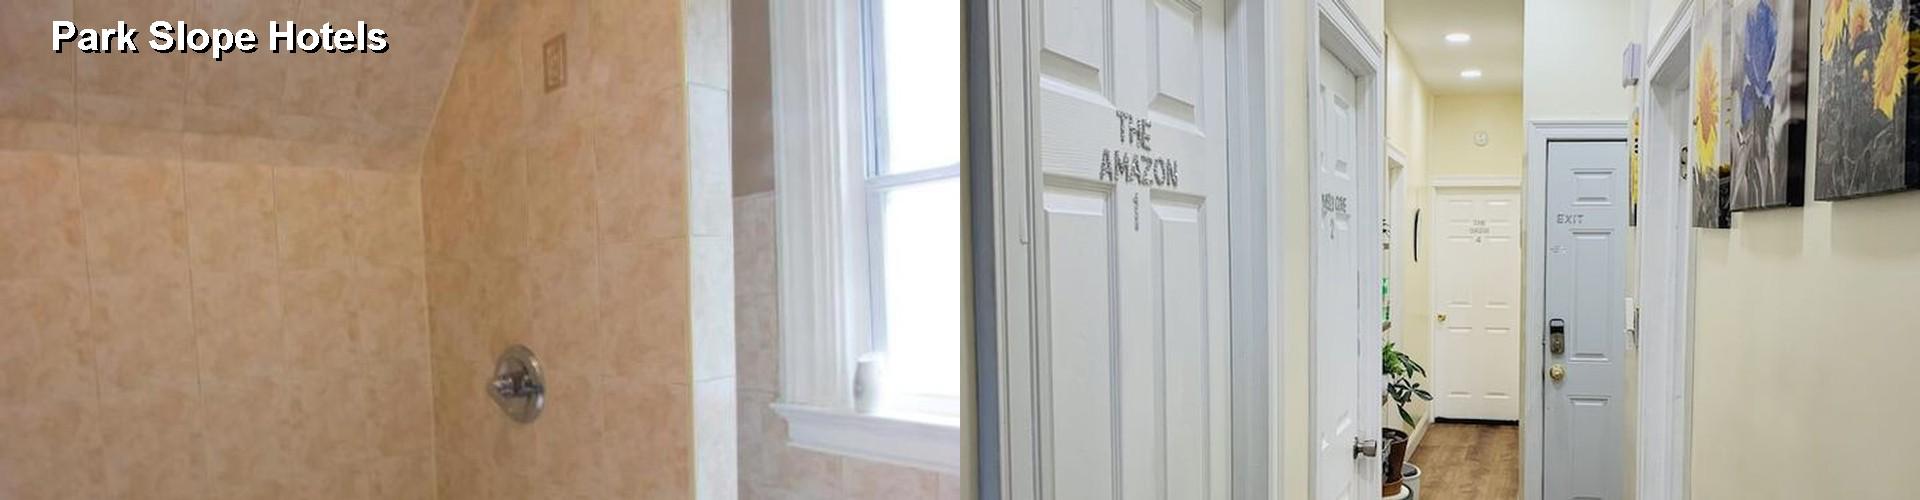 5 Best Hotels Near Park Slope